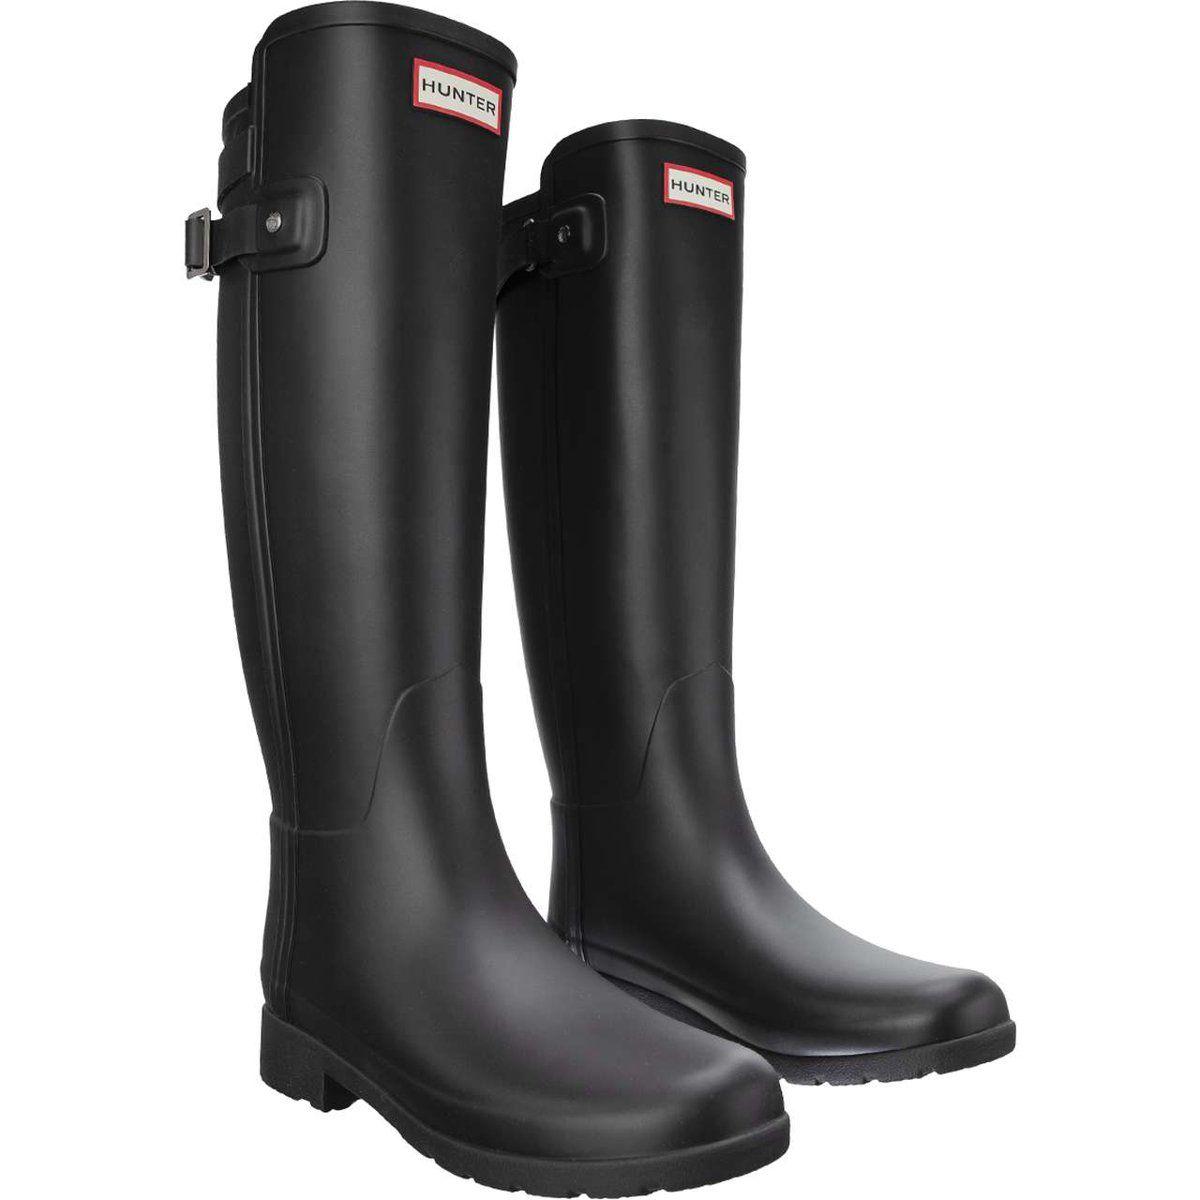 Kalosze Damskie Hunter Hunter Czarne Original Refined Back Strap Black Boots Hunter Boots Rain Boots